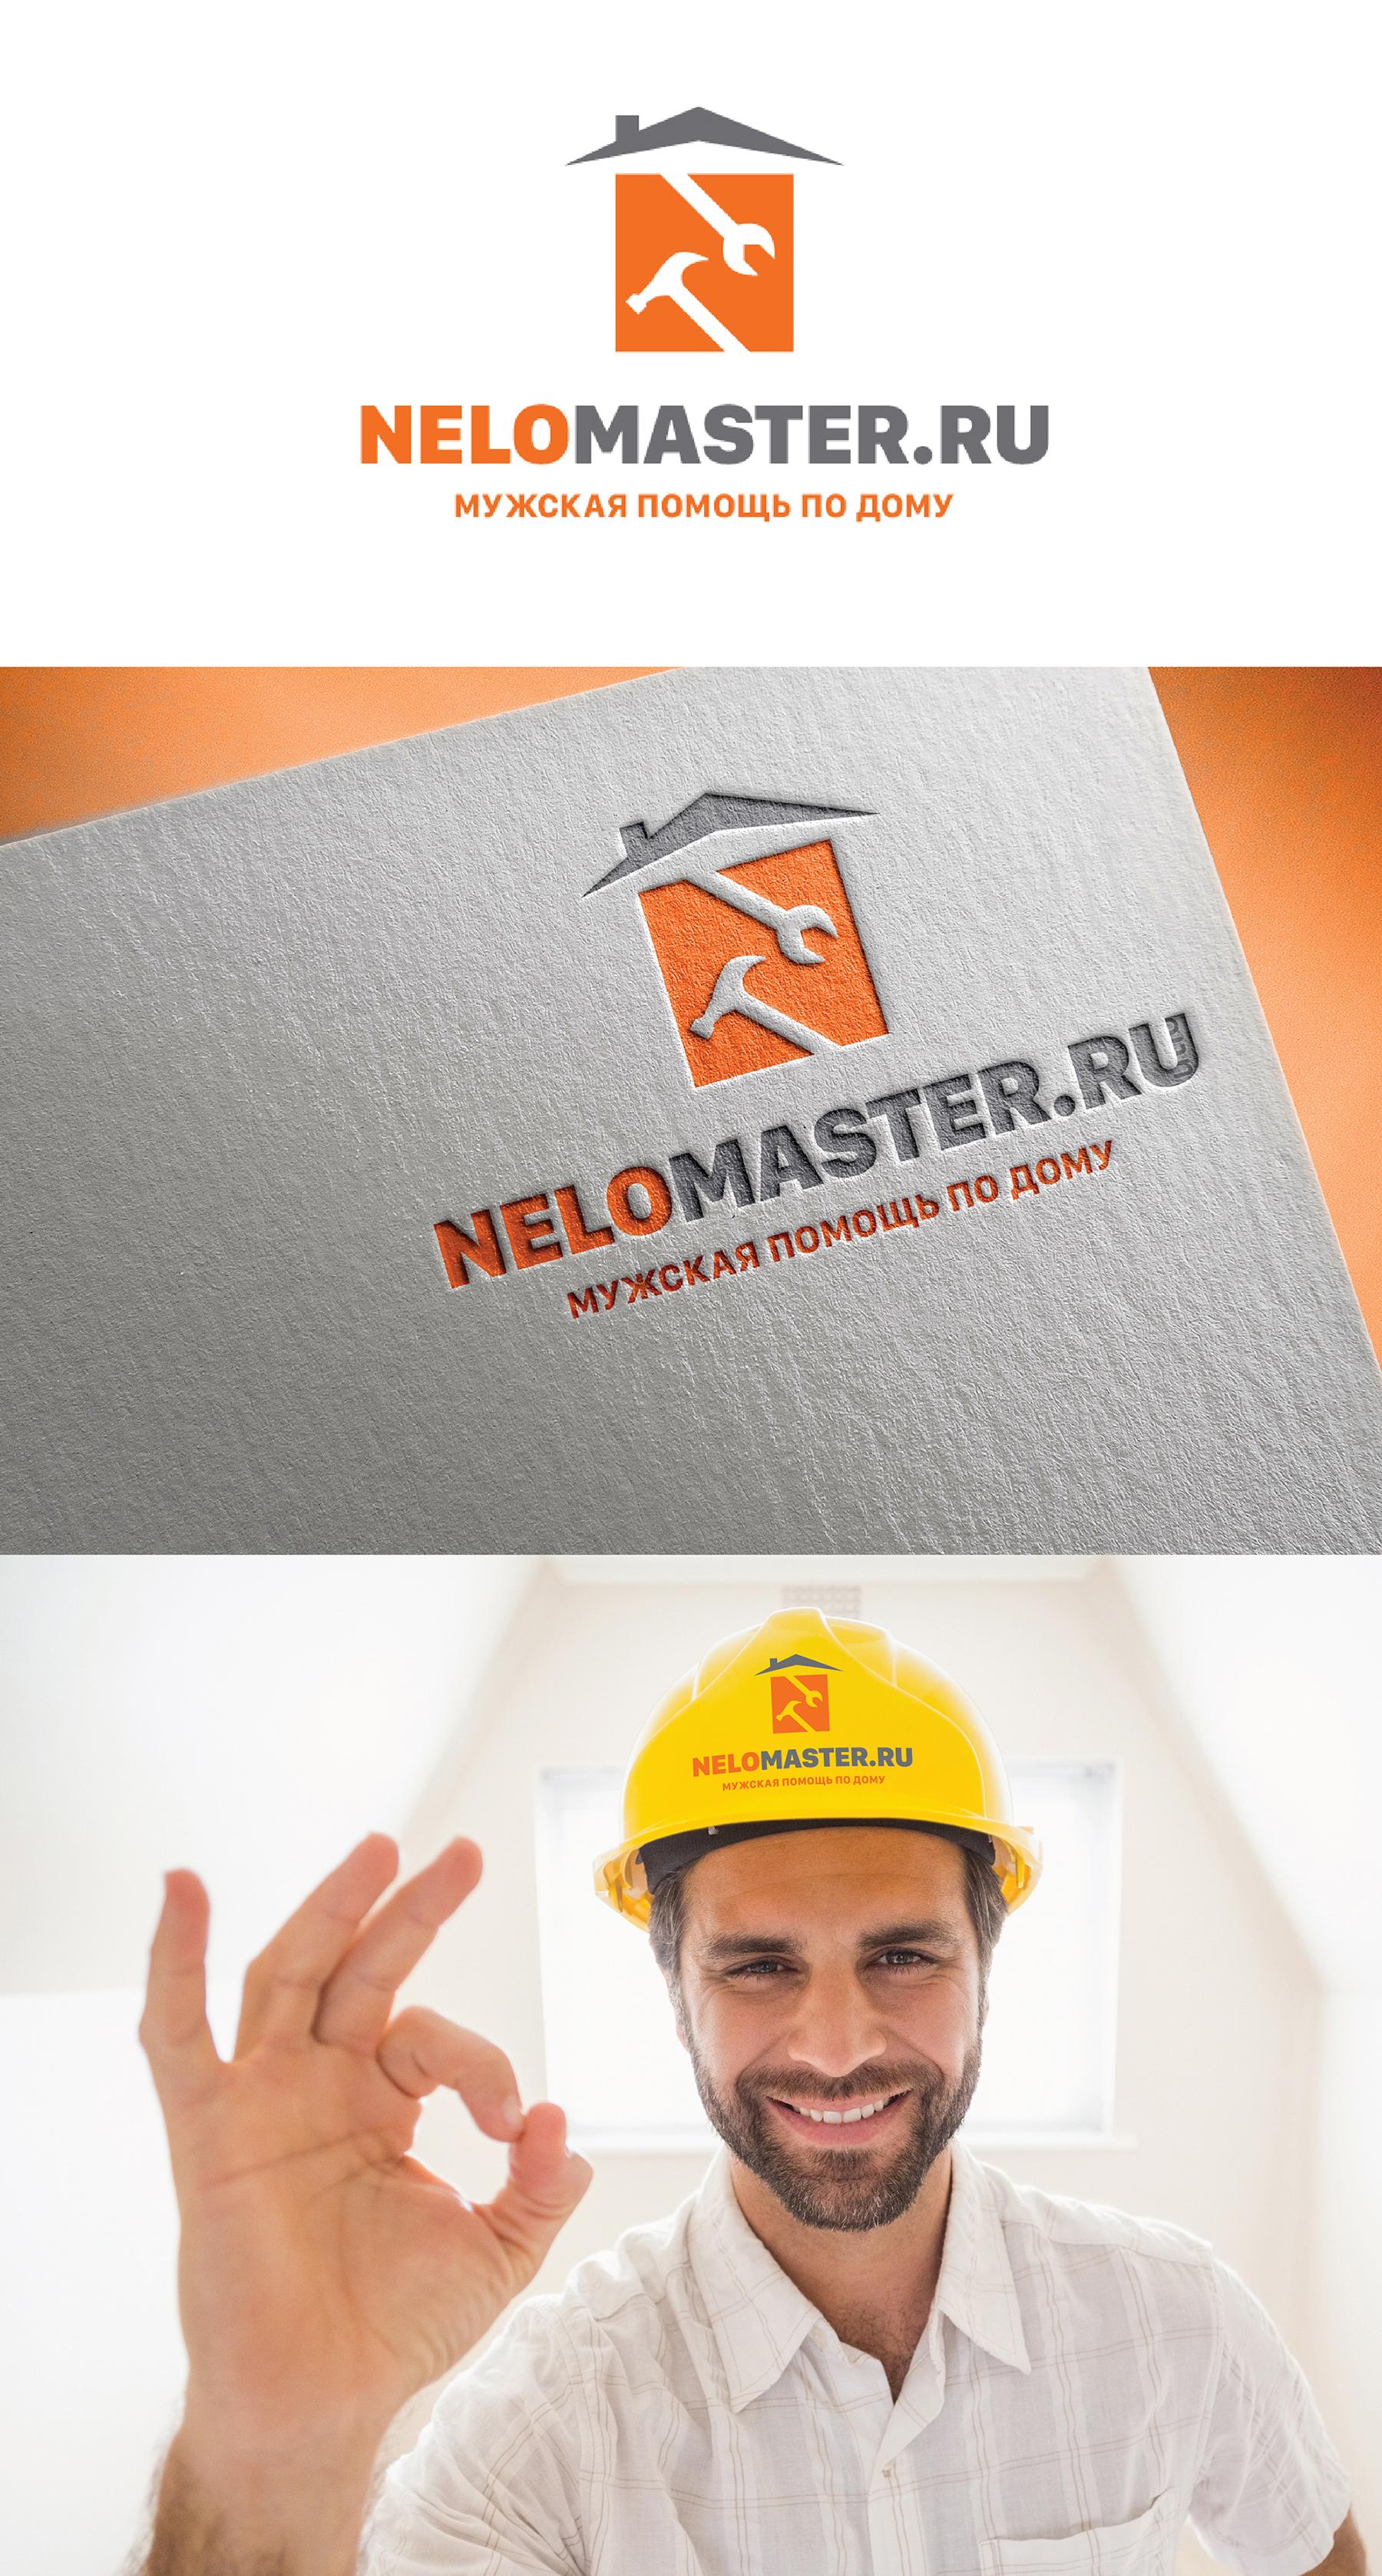 Nelomaster